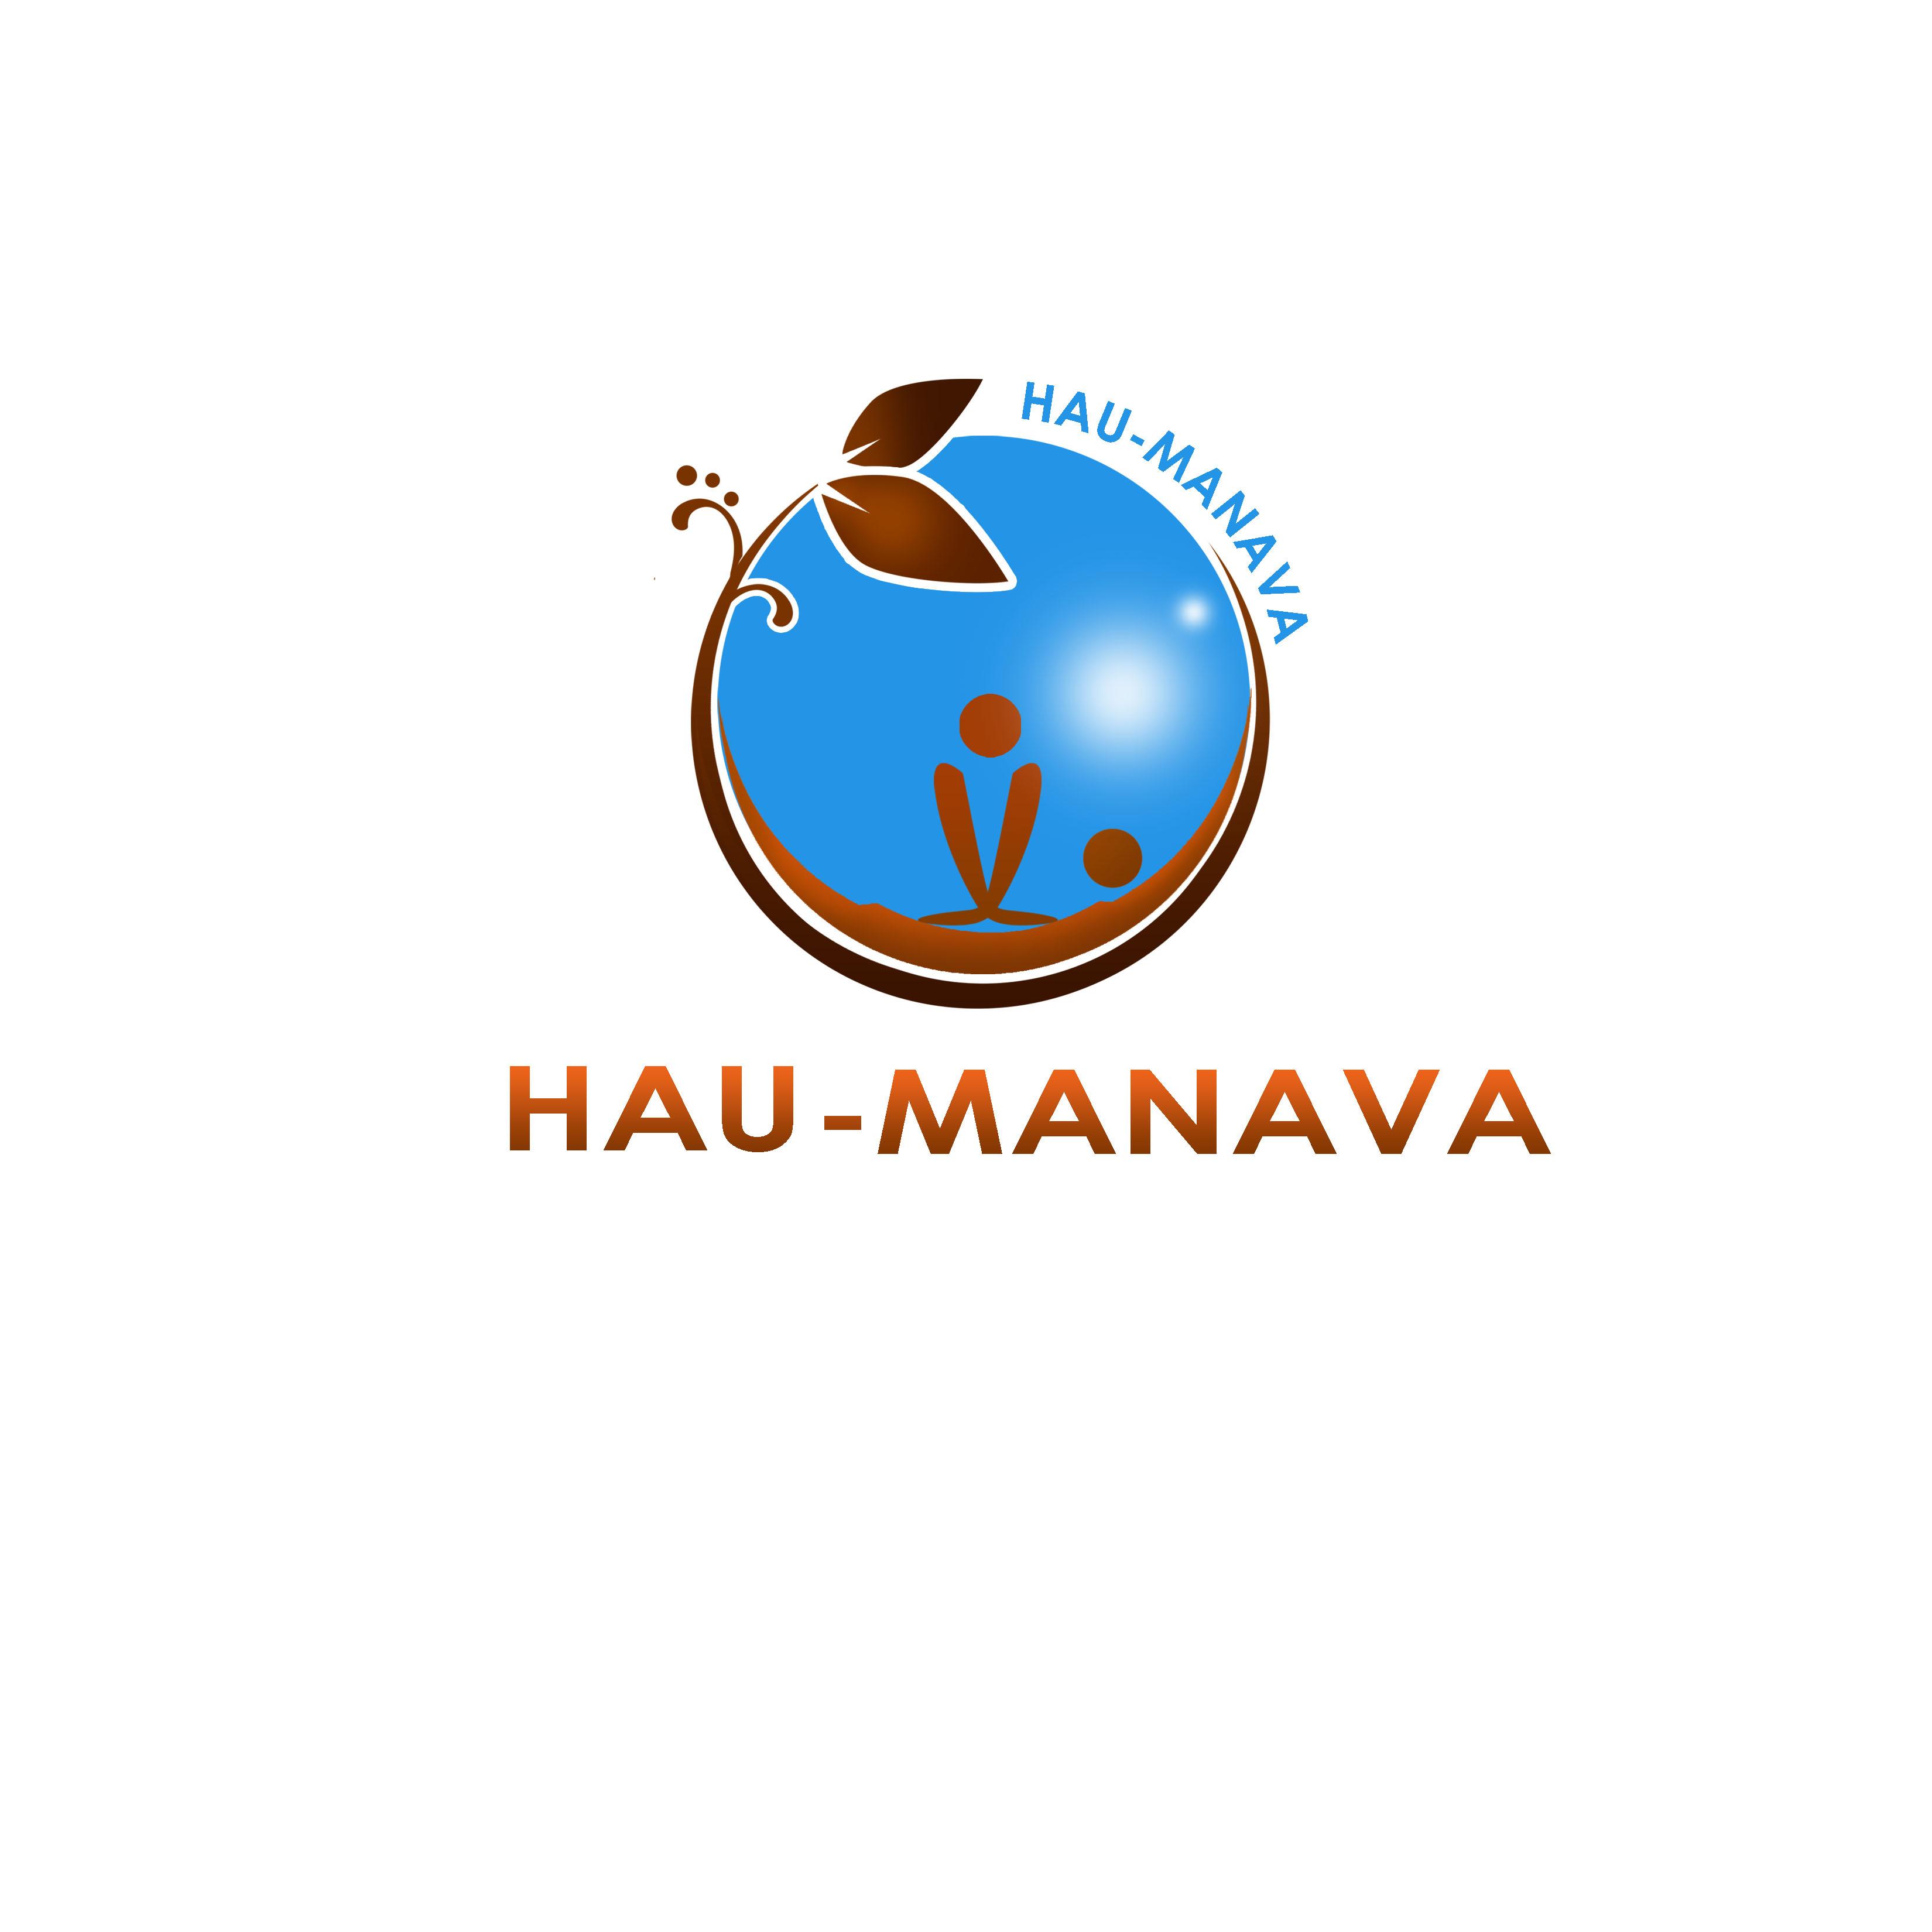 Logo Design by Allan Esclamado - Entry No. 11 in the Logo Design Contest Hau-Manava Logo Design.